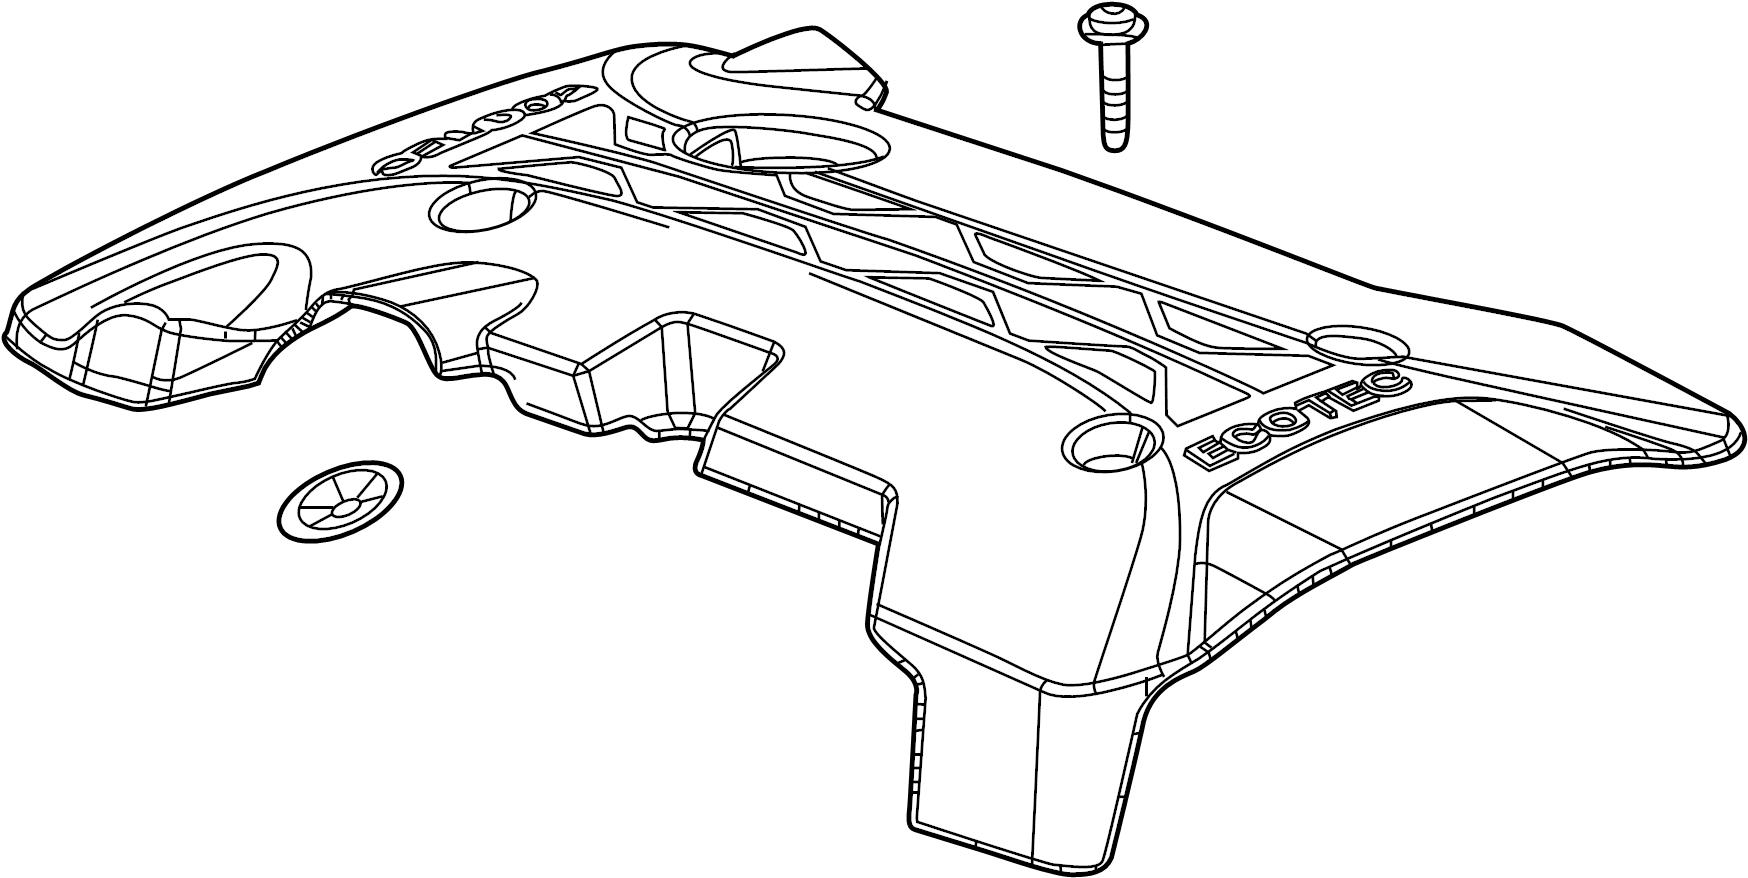 Buick Regal Engine Cover. 2.0 LITER TURBO. 2.0 LITER TURBO